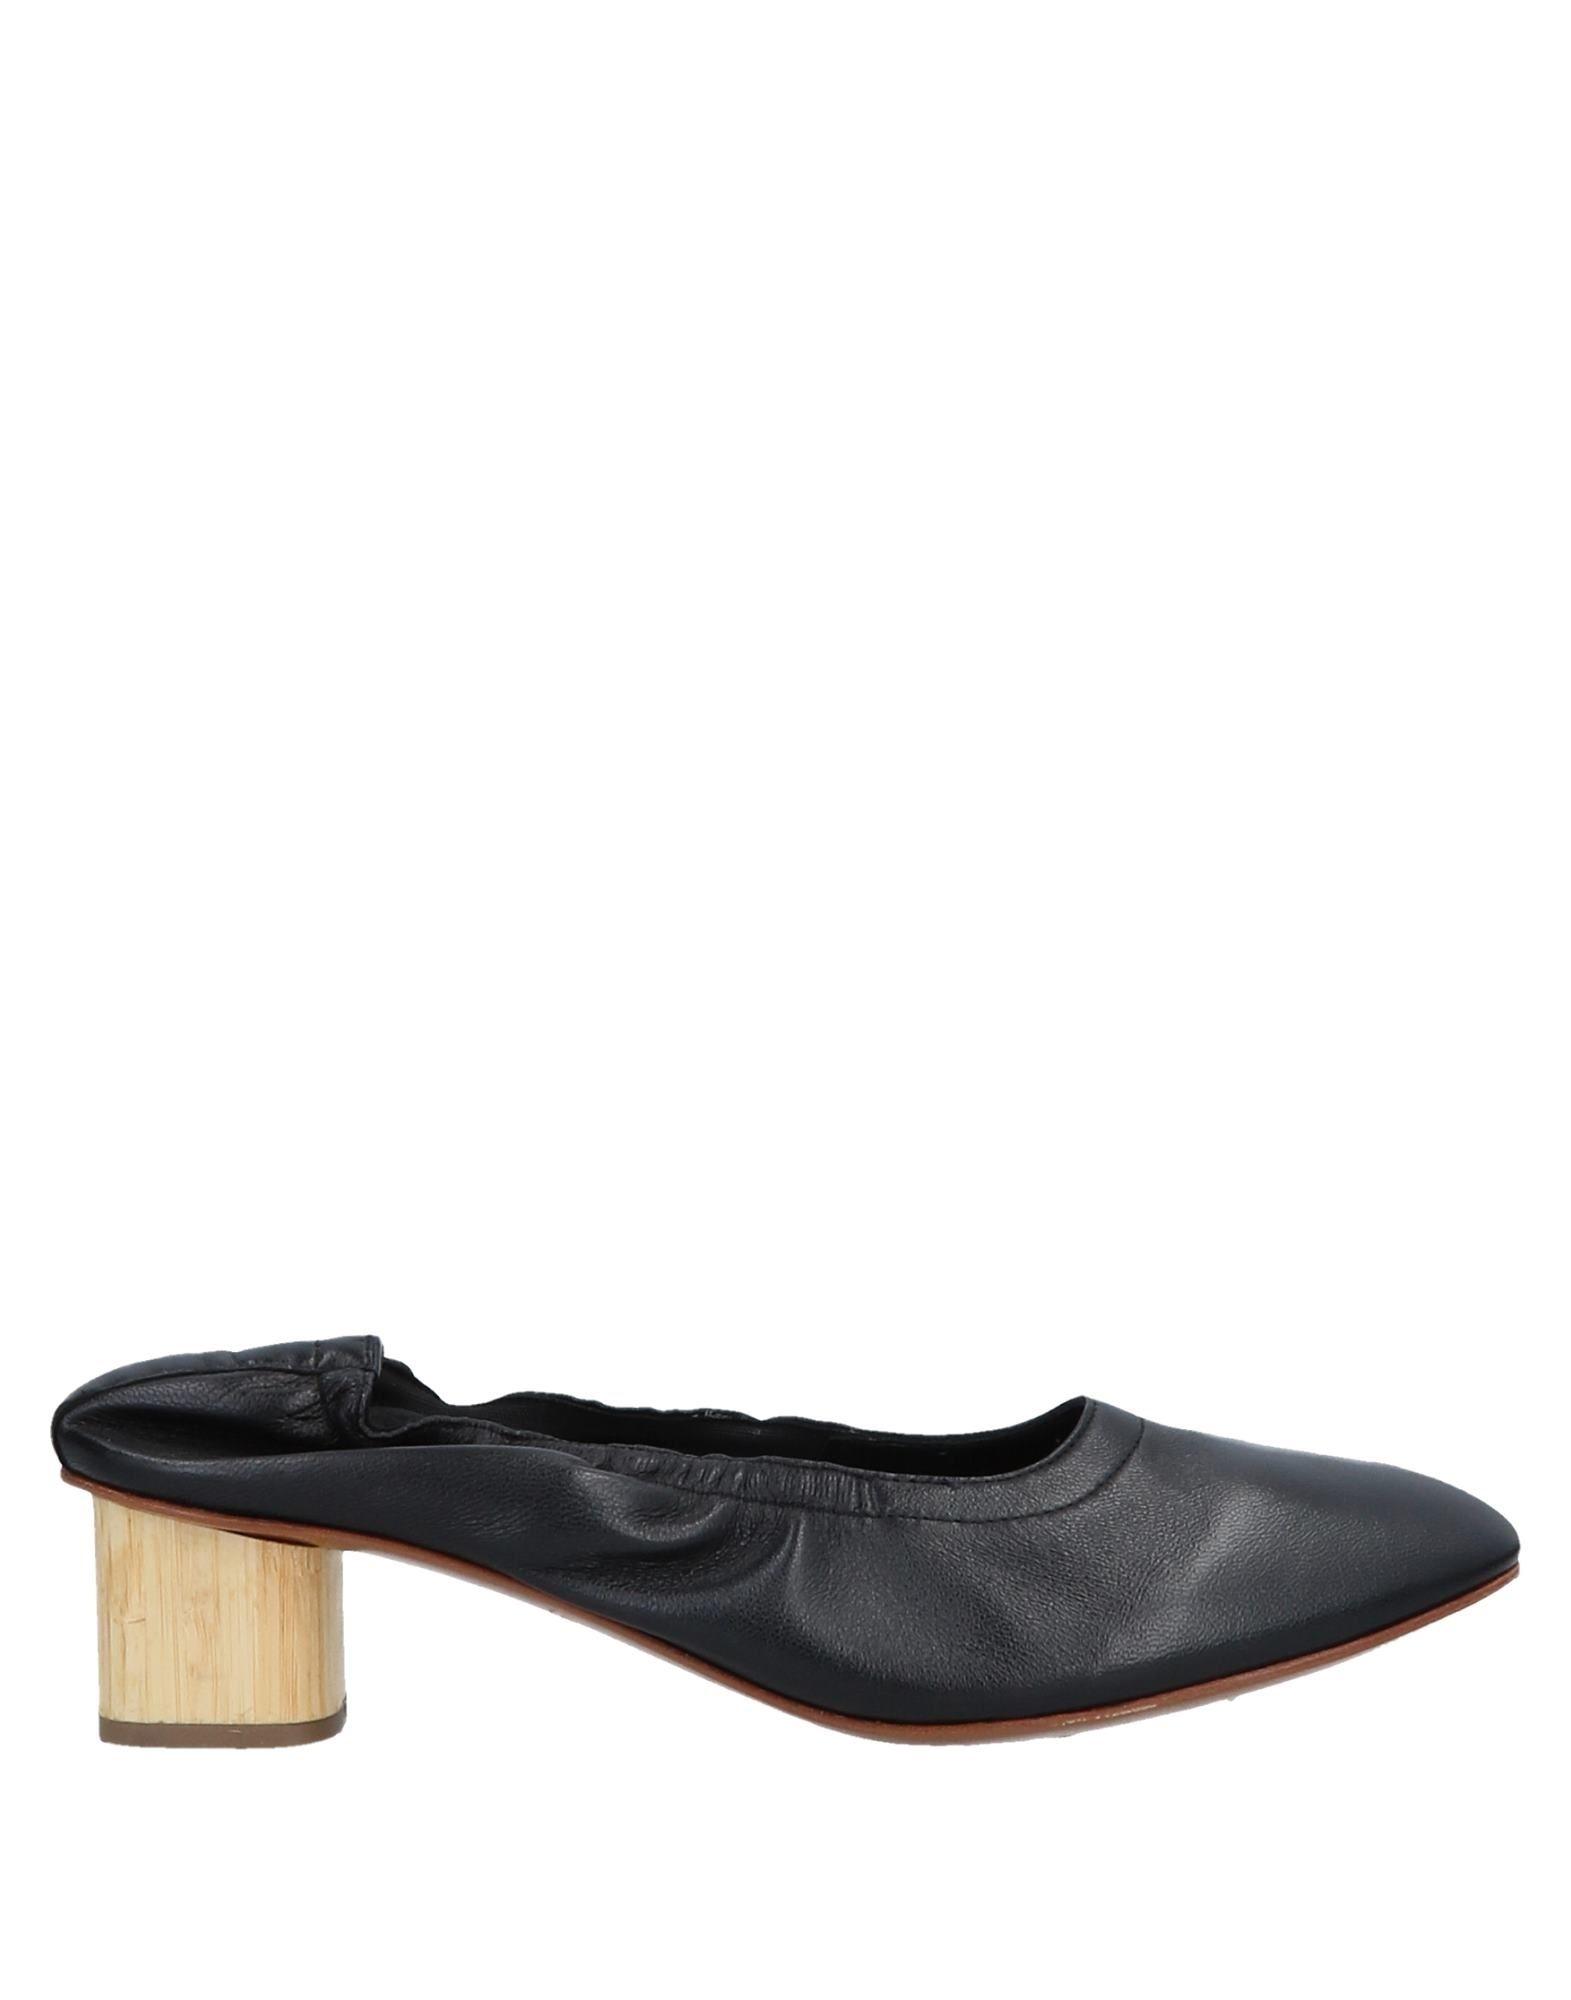 ROBERT CLERGERIE Туфли цены онлайн